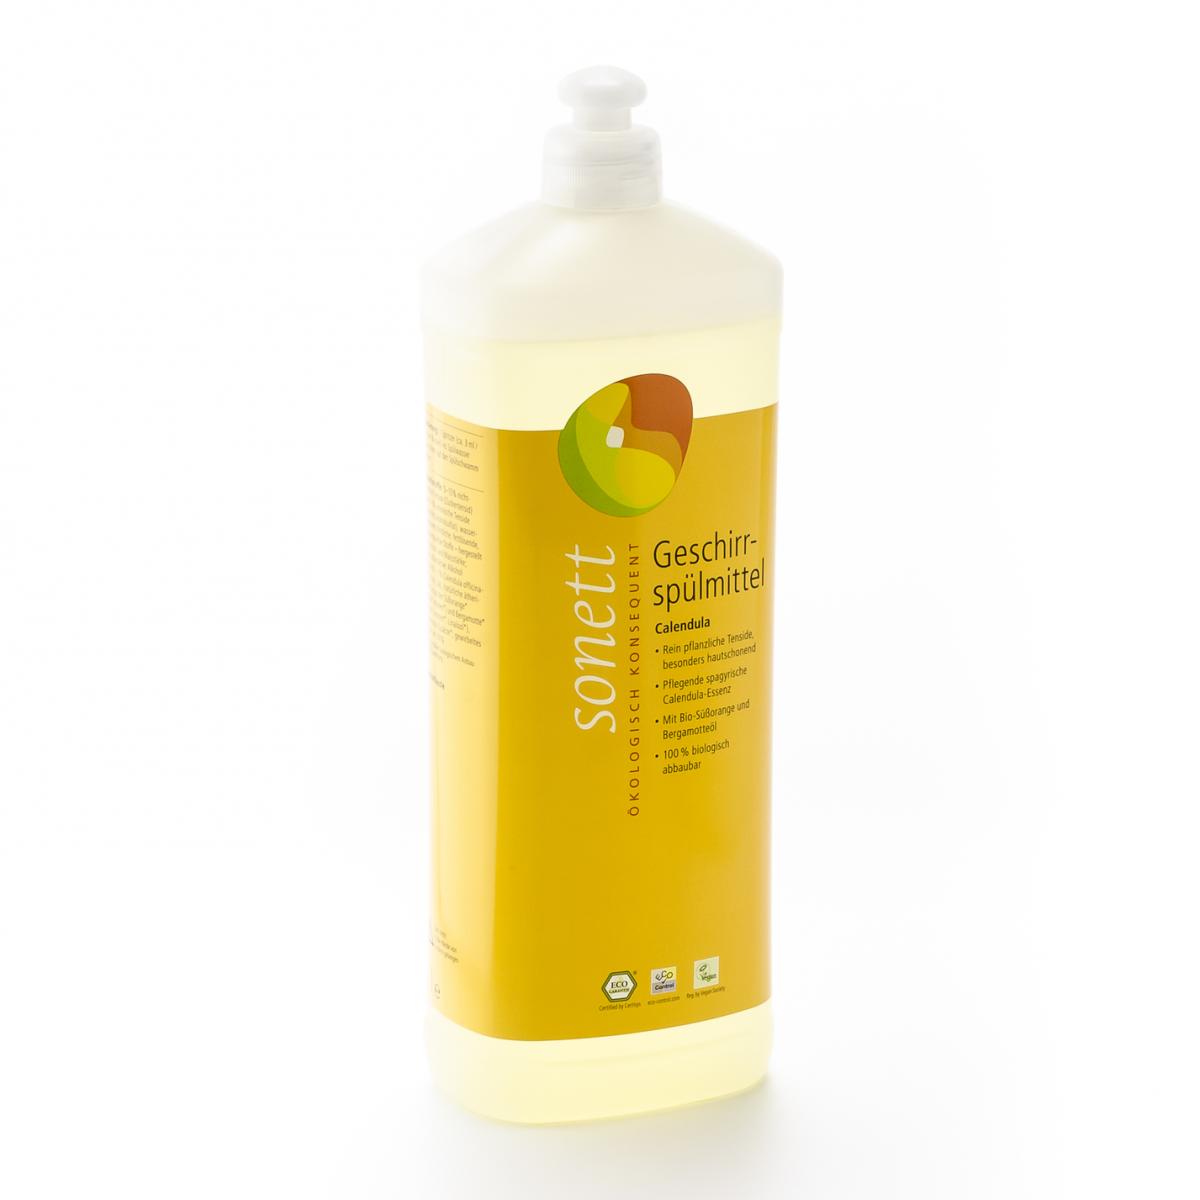 Geschirrspülmittel Calendula, Nachfüllflasche Flasche 1 l/Plastik Einweg - Sonett